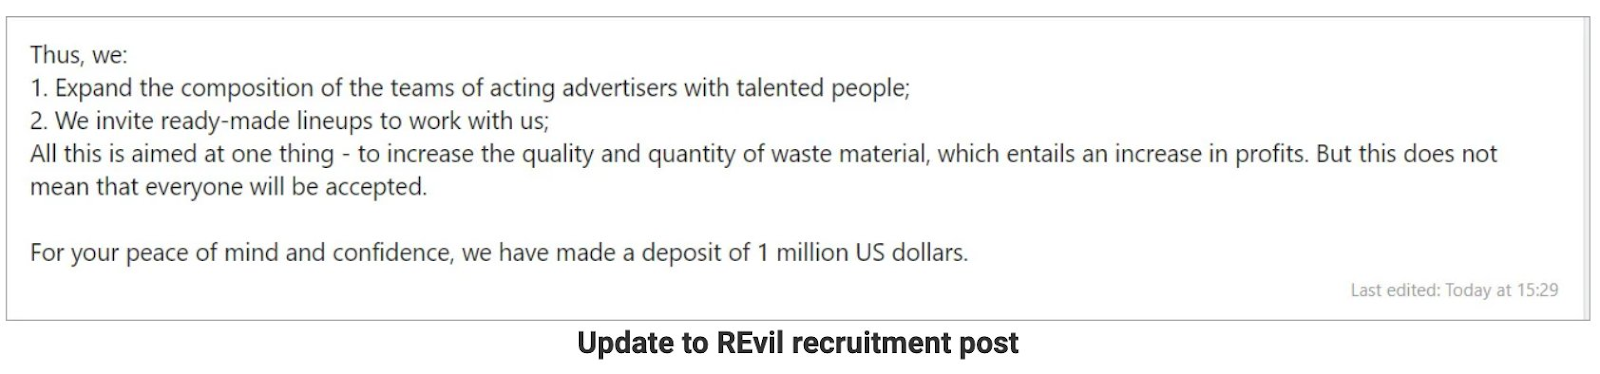 Post de recrutamento